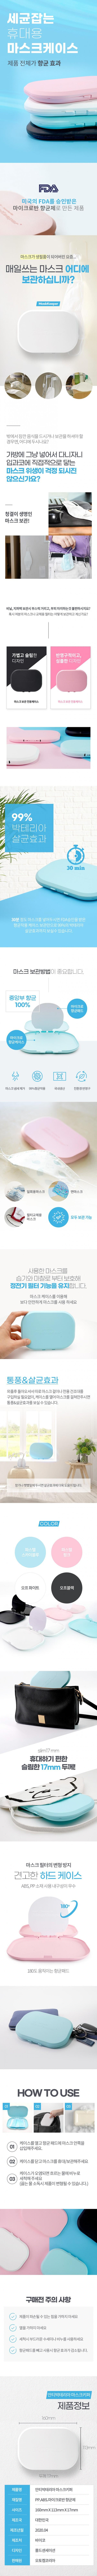 [D050]마스크 케이스 촬영 및 상세페이지 제작